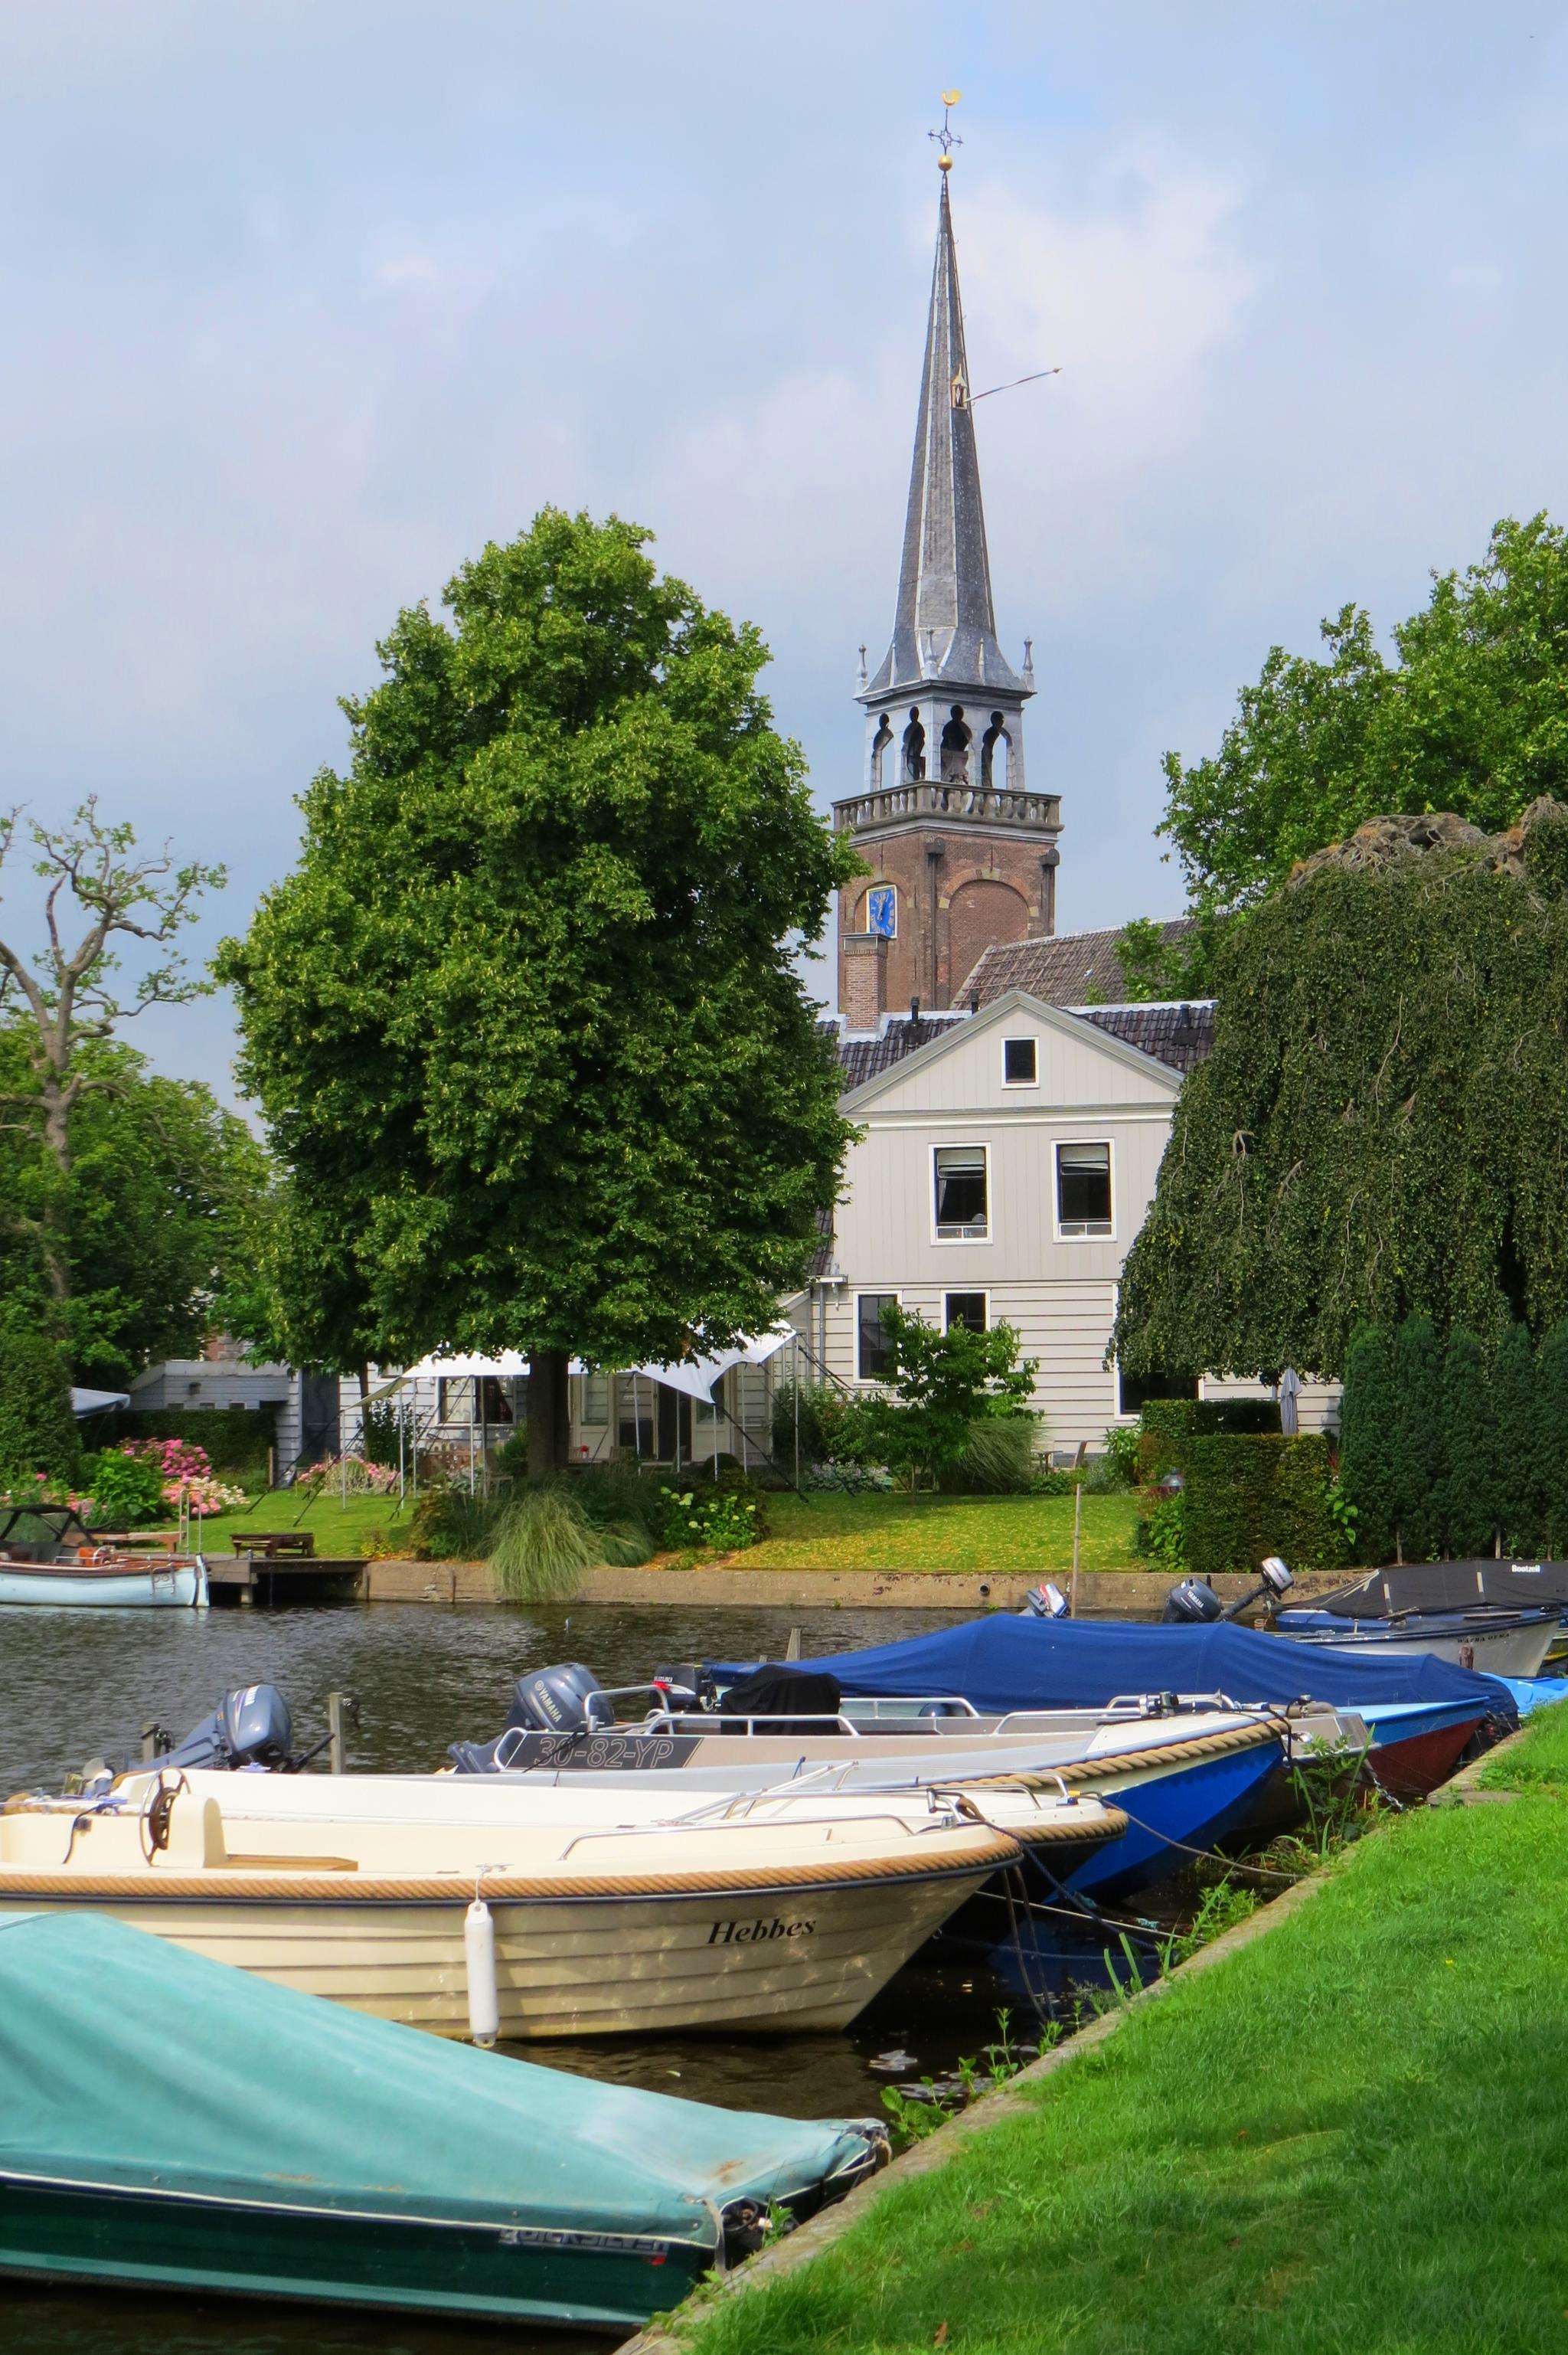 miasta w Holandii Broek in Wateland